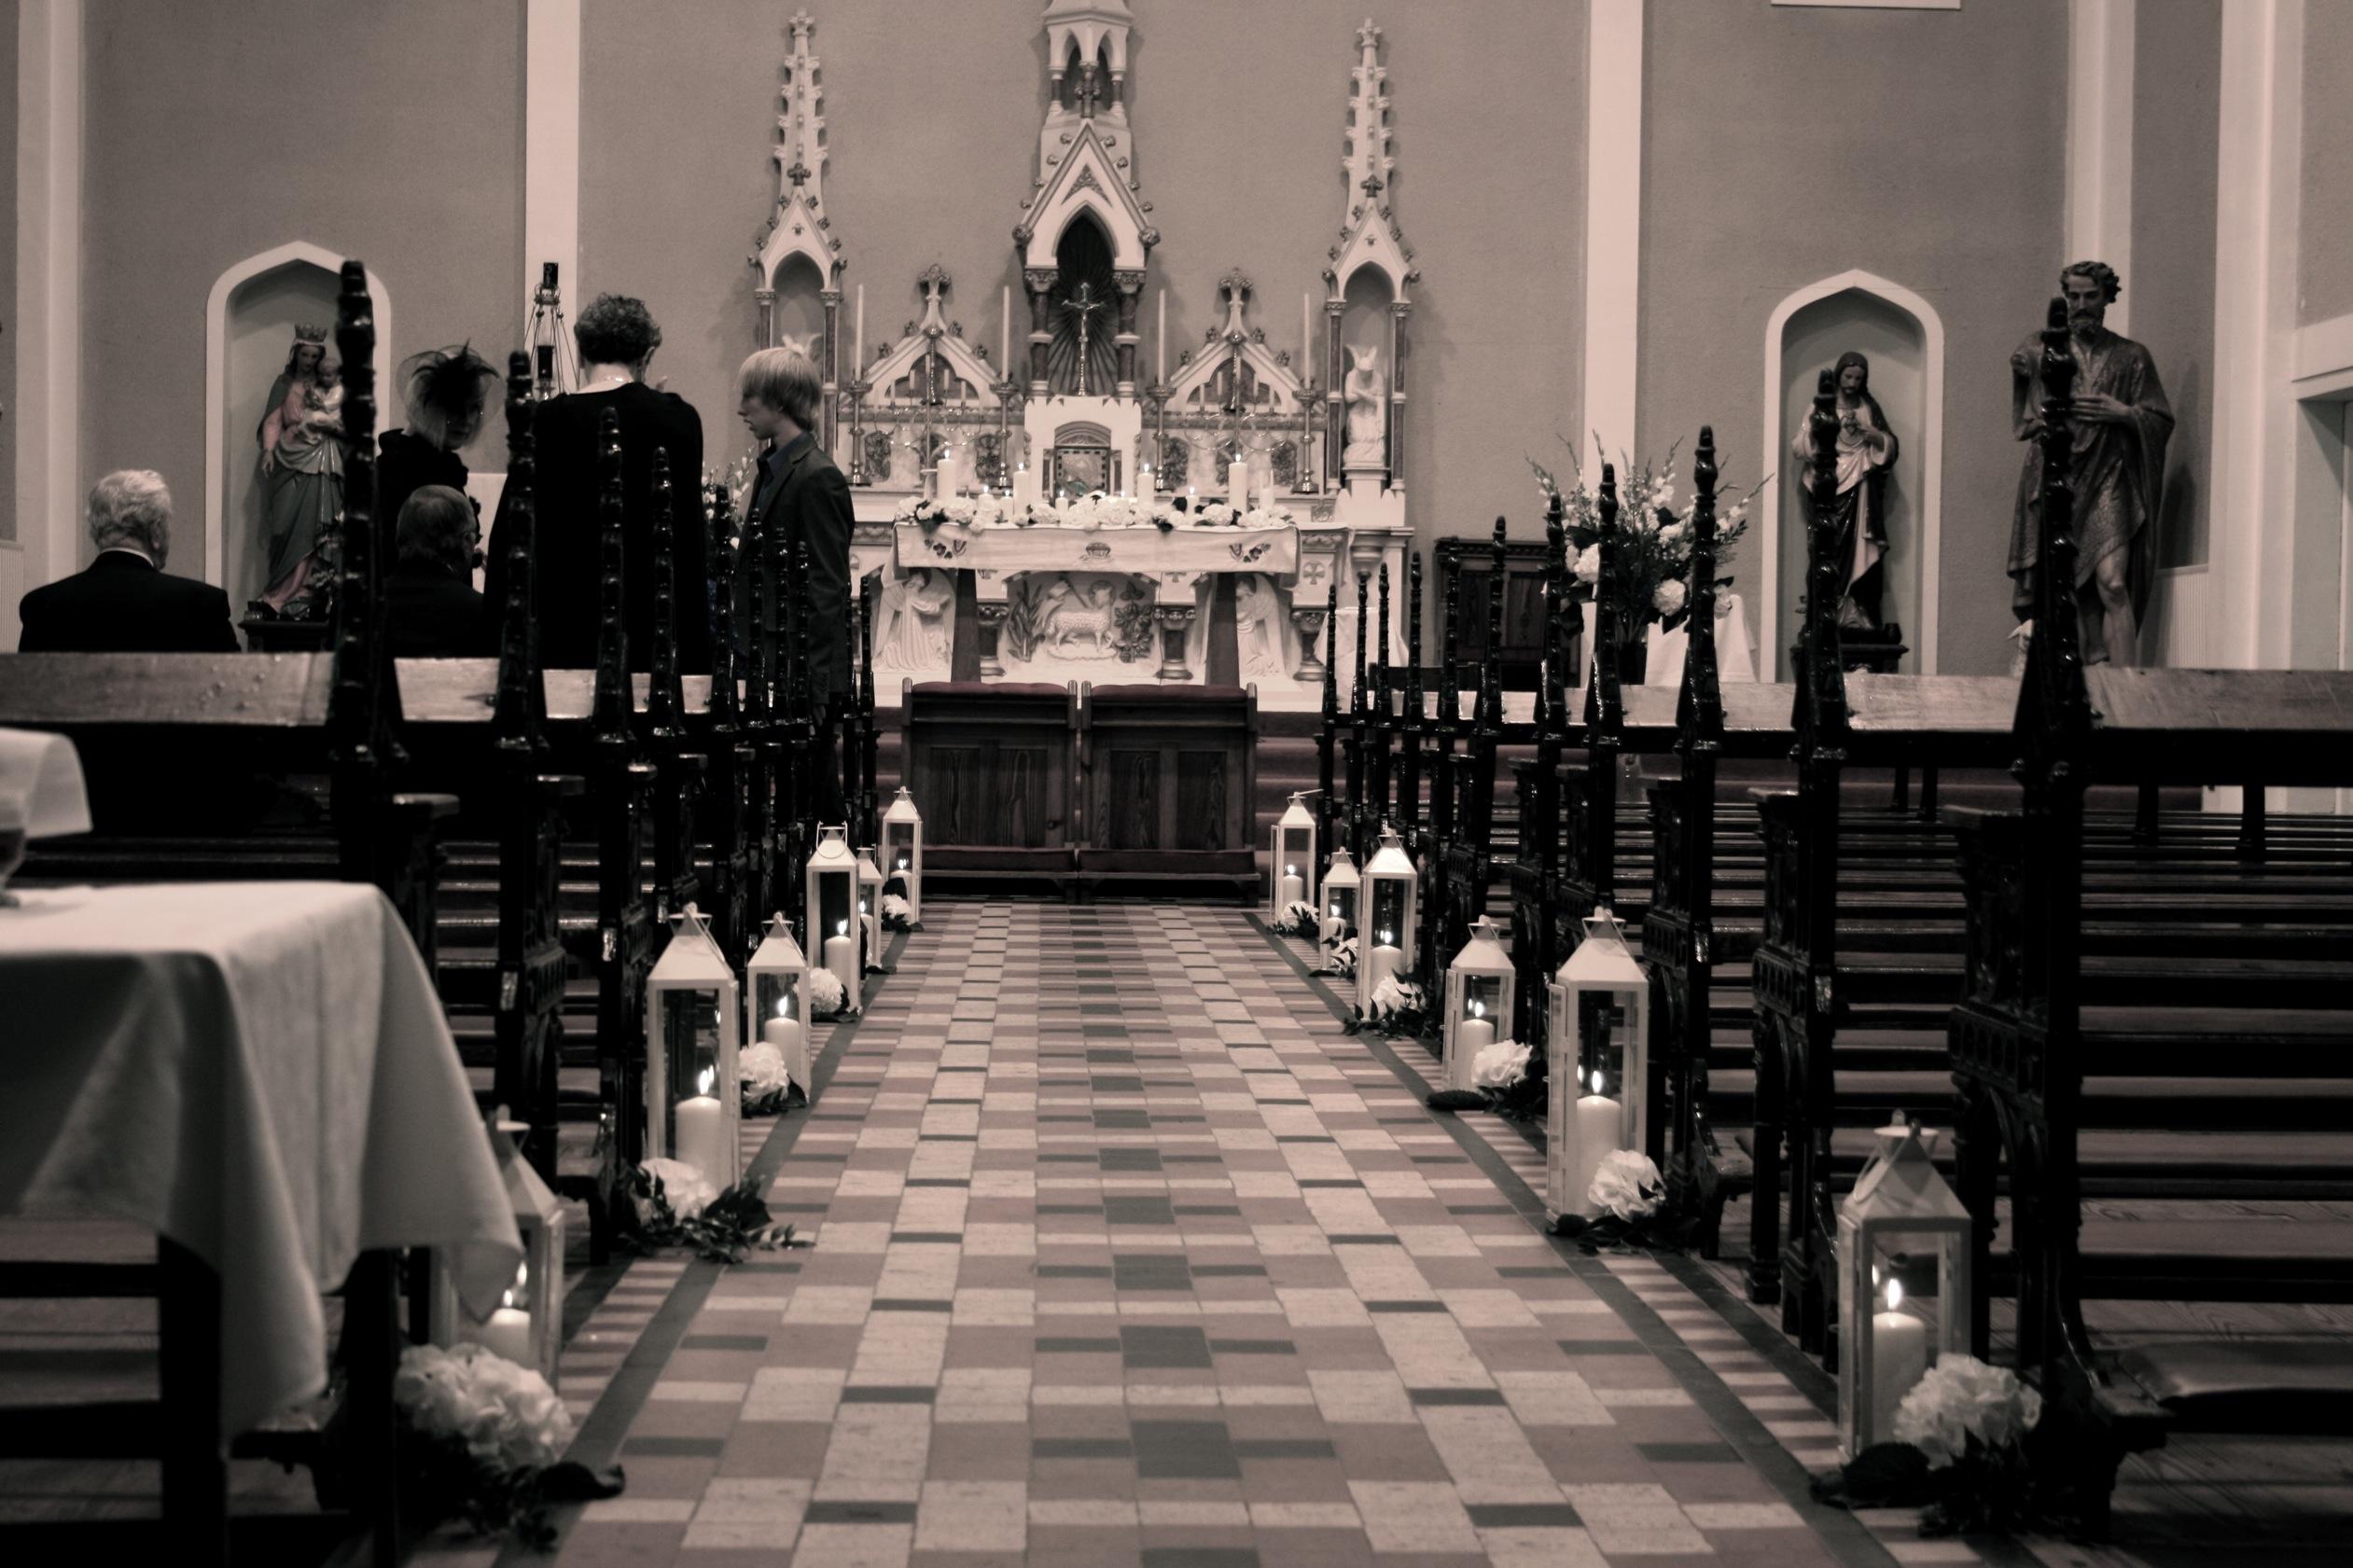 weddingflowersireland wordpress lanterns for weddings Wedding Church nearWaterford castle Ireland